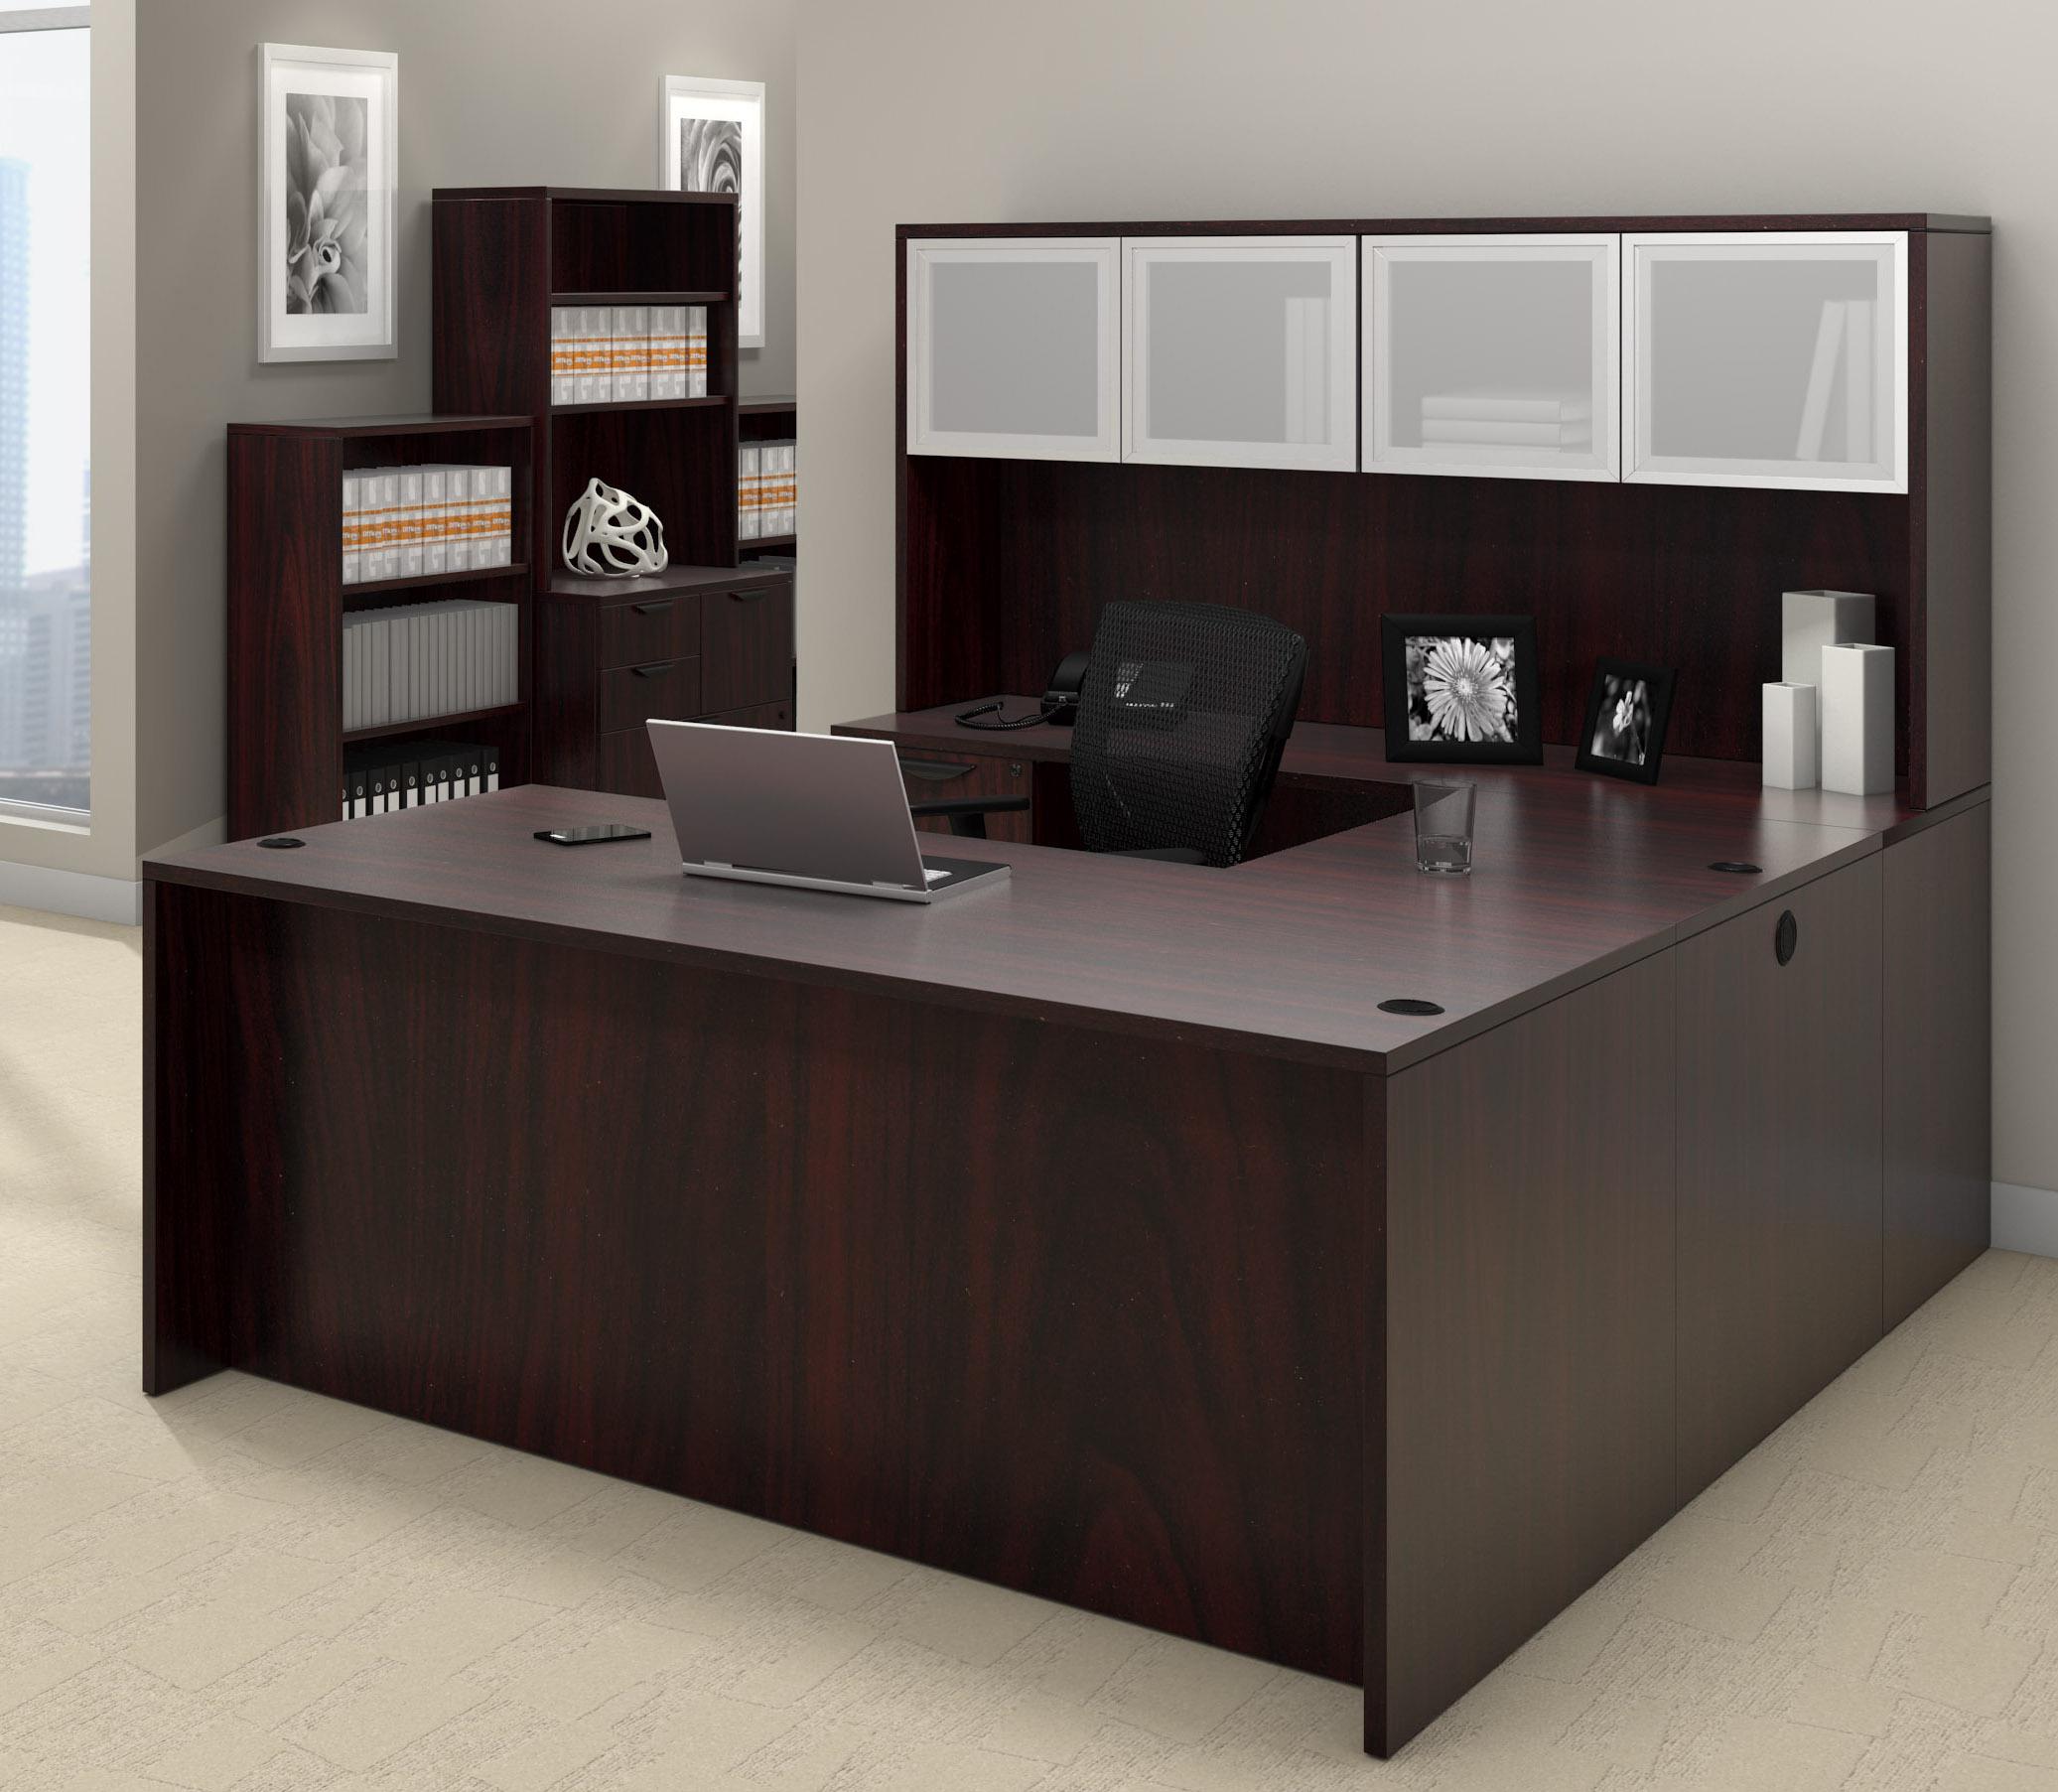 offices to go superior laminate u-shaped workstation with mahogany finish